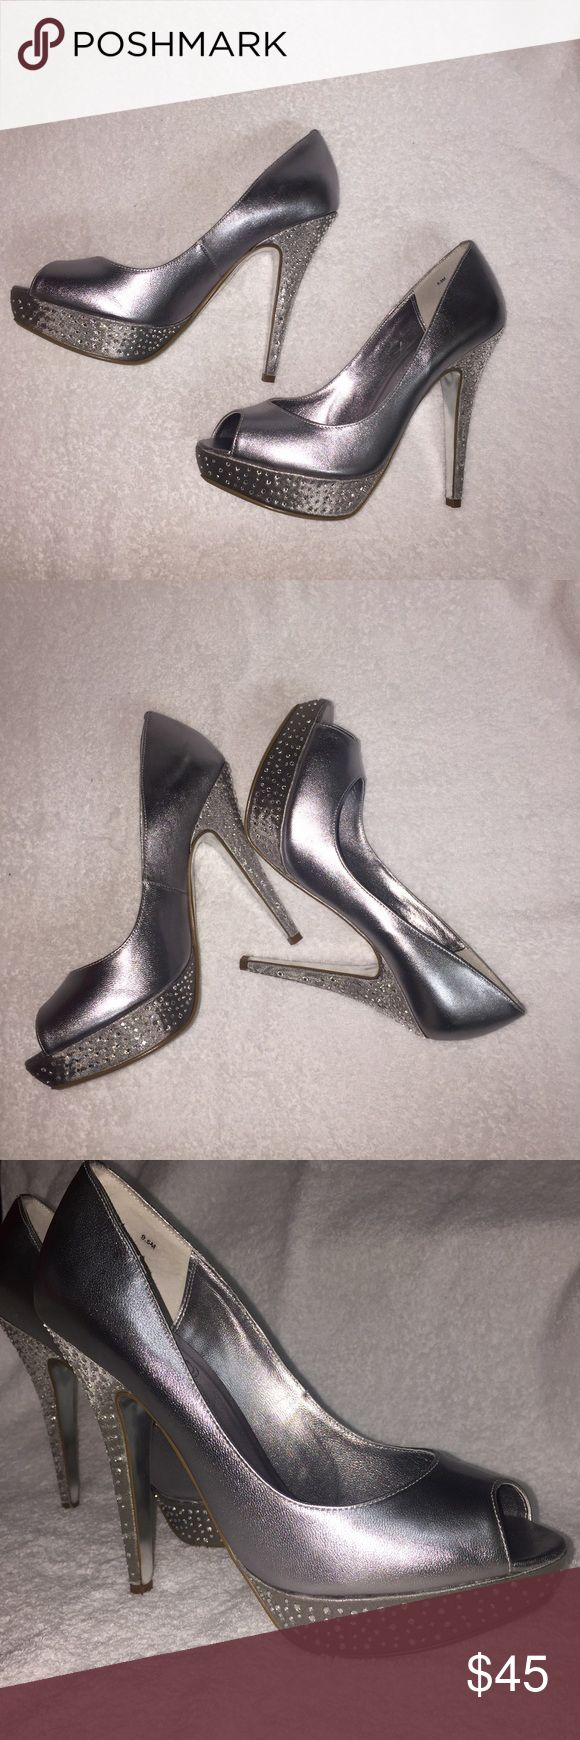 Spotted while shopping on Poshmark: Mariah Carey Peep toe Pumps ❣️! #poshmark #fashion #shopping #style #Mariah Carey  #Shoes